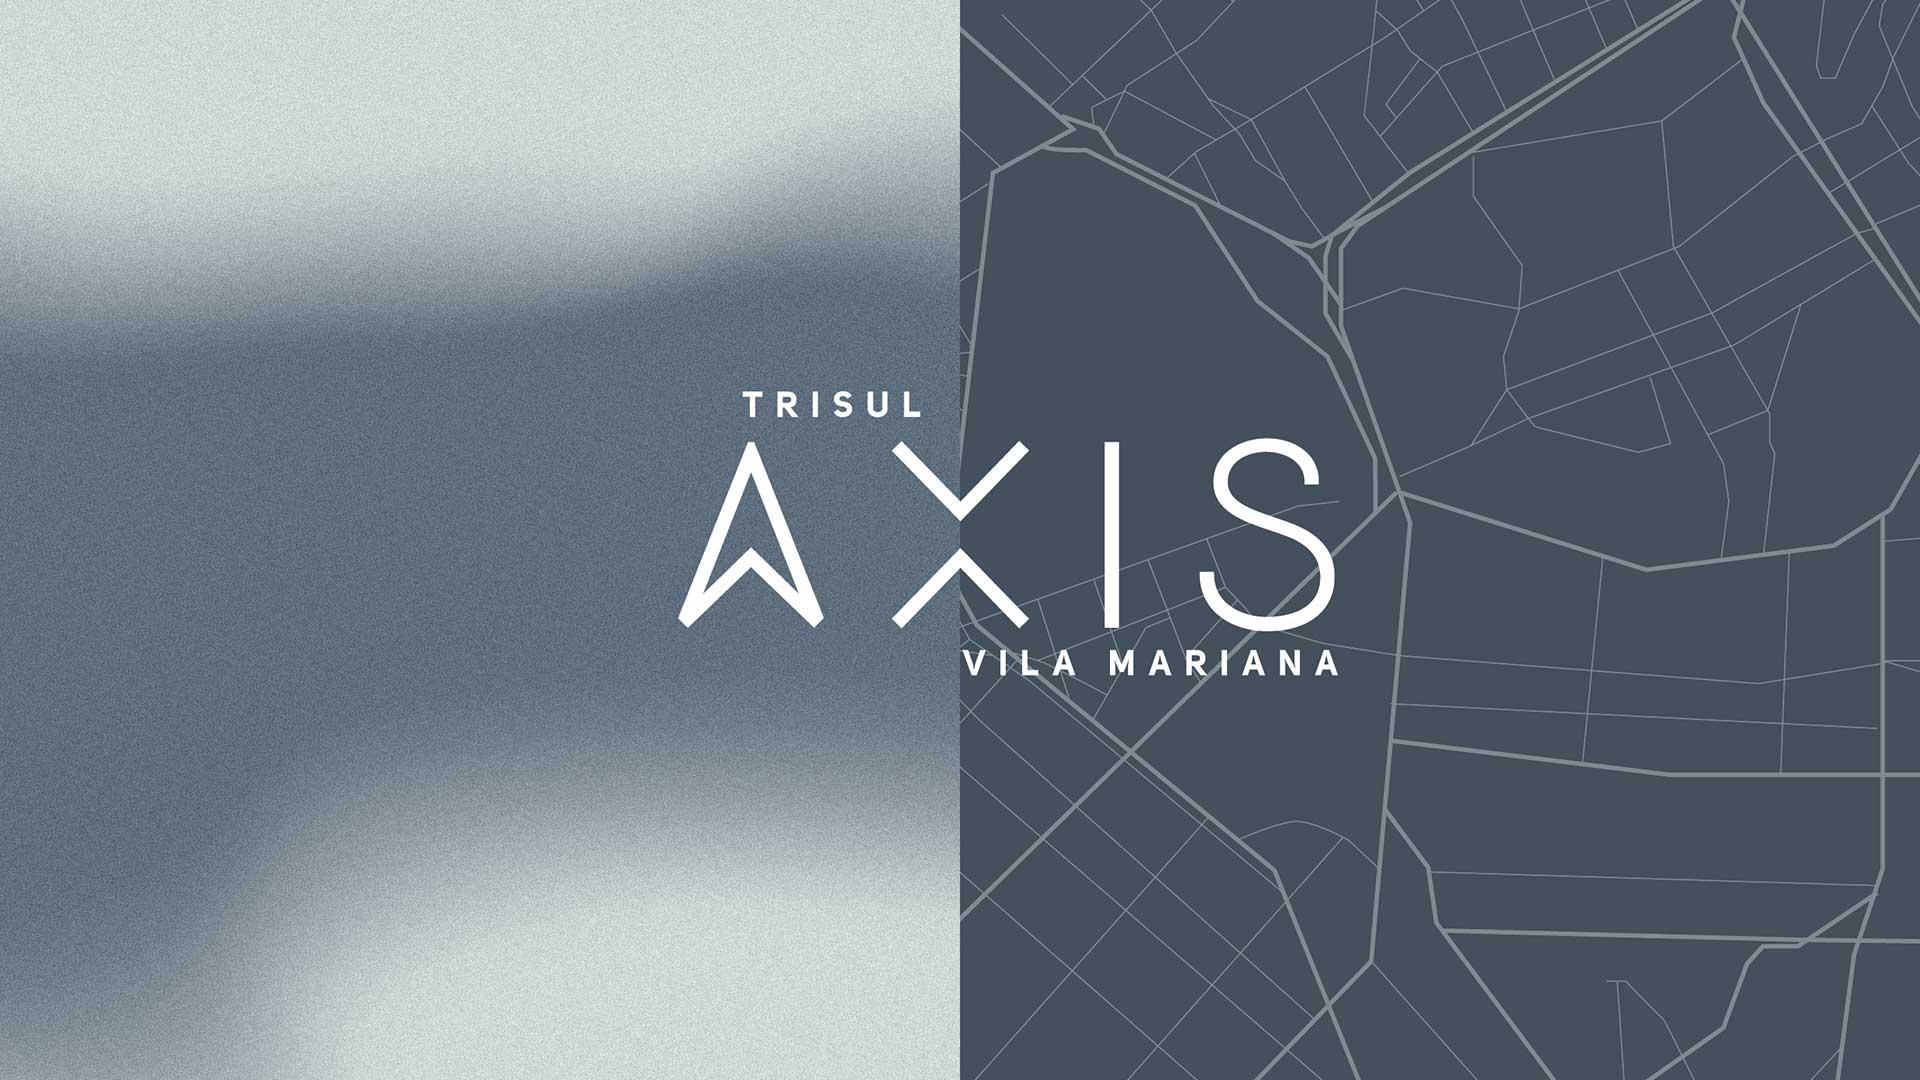 Trisul_Axis4_final